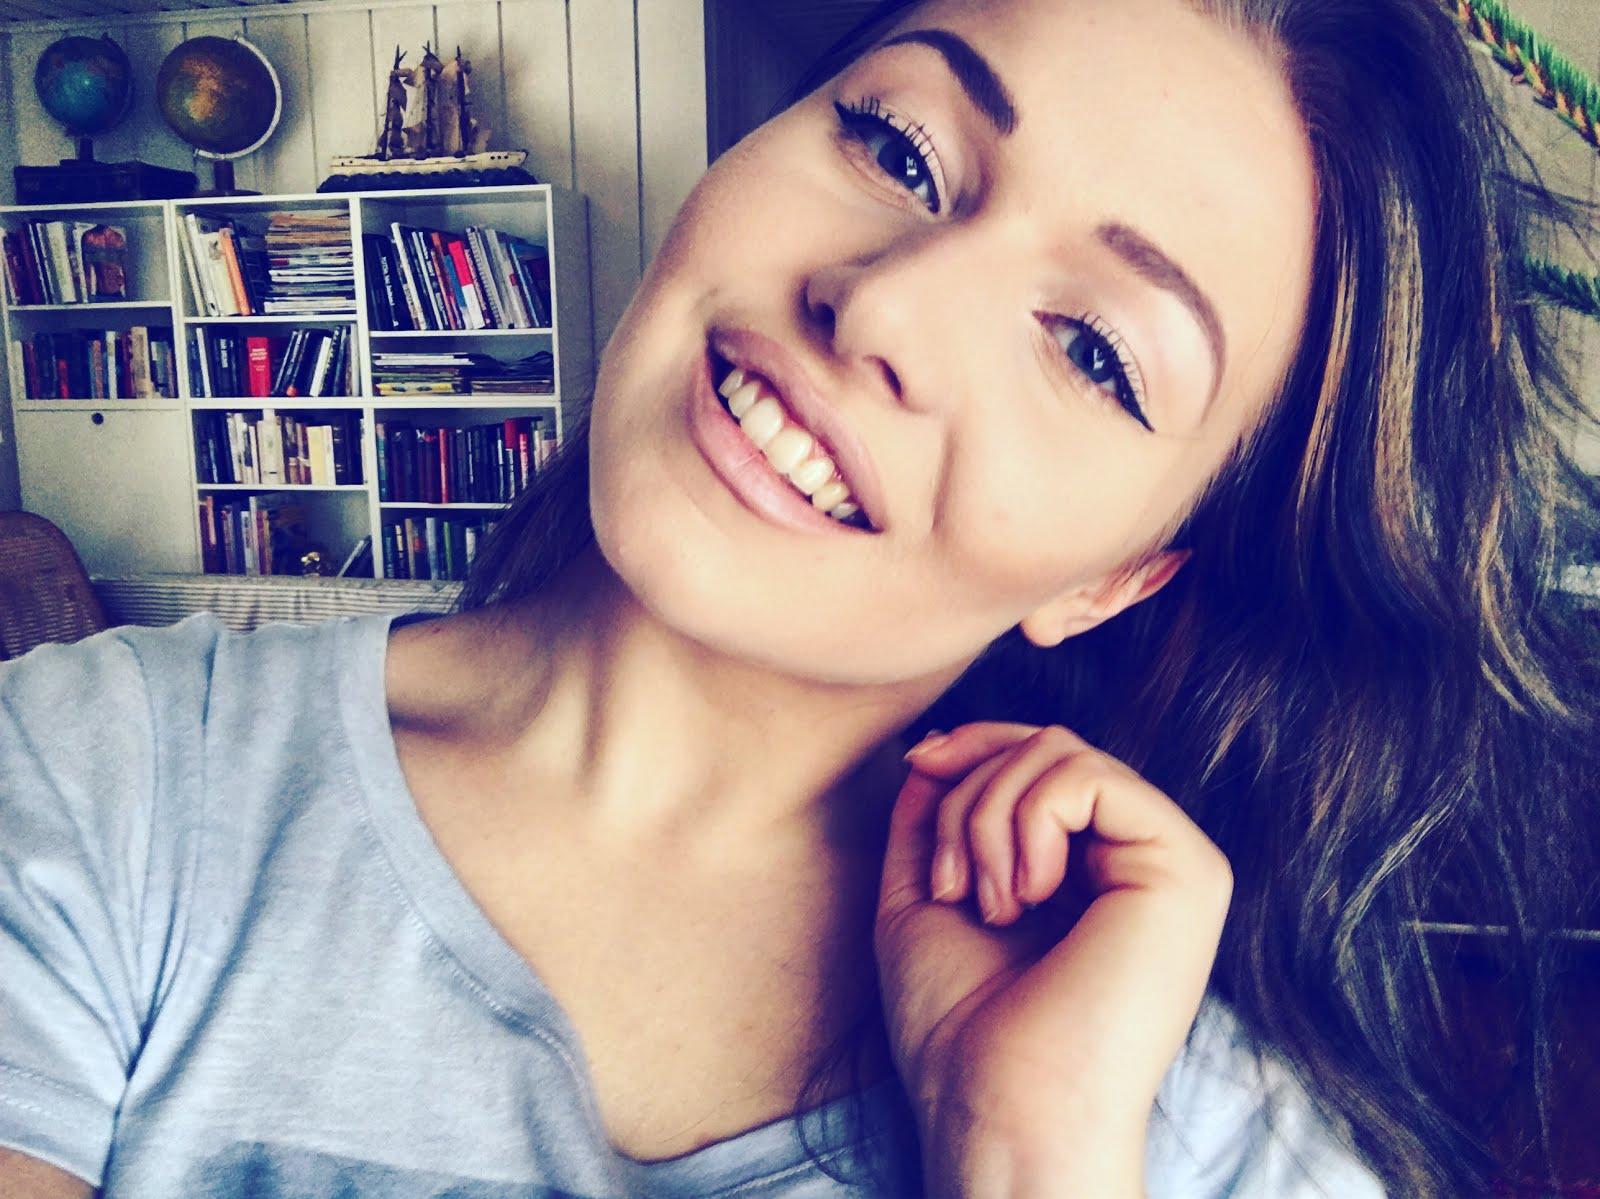 Finnish, 22